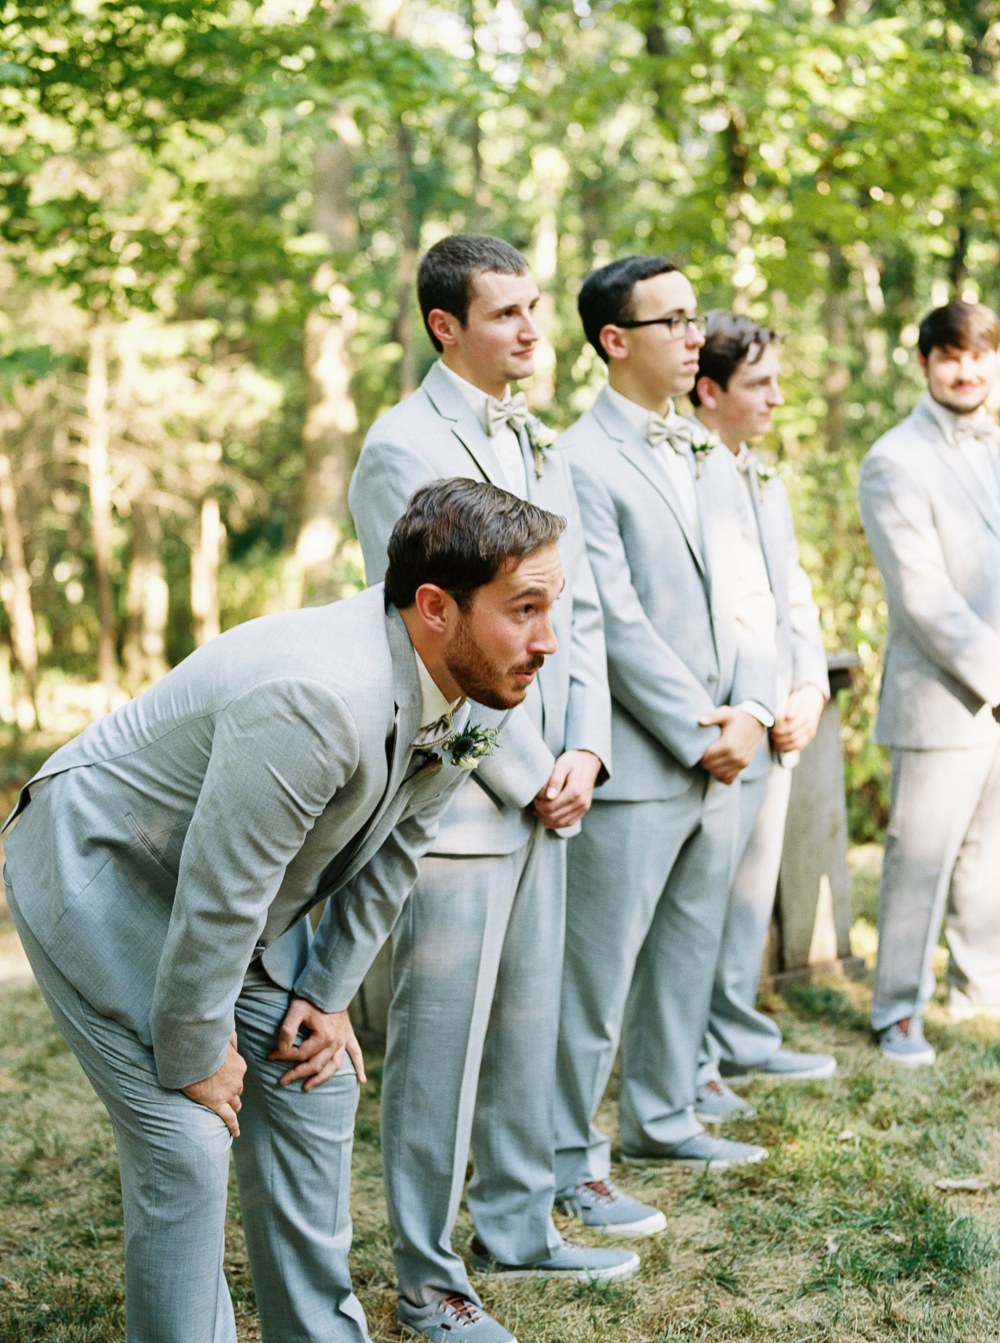 jamie+trey_wrens nest film wedding photographers natural light ©2016abigailbobophotography-20.jpg